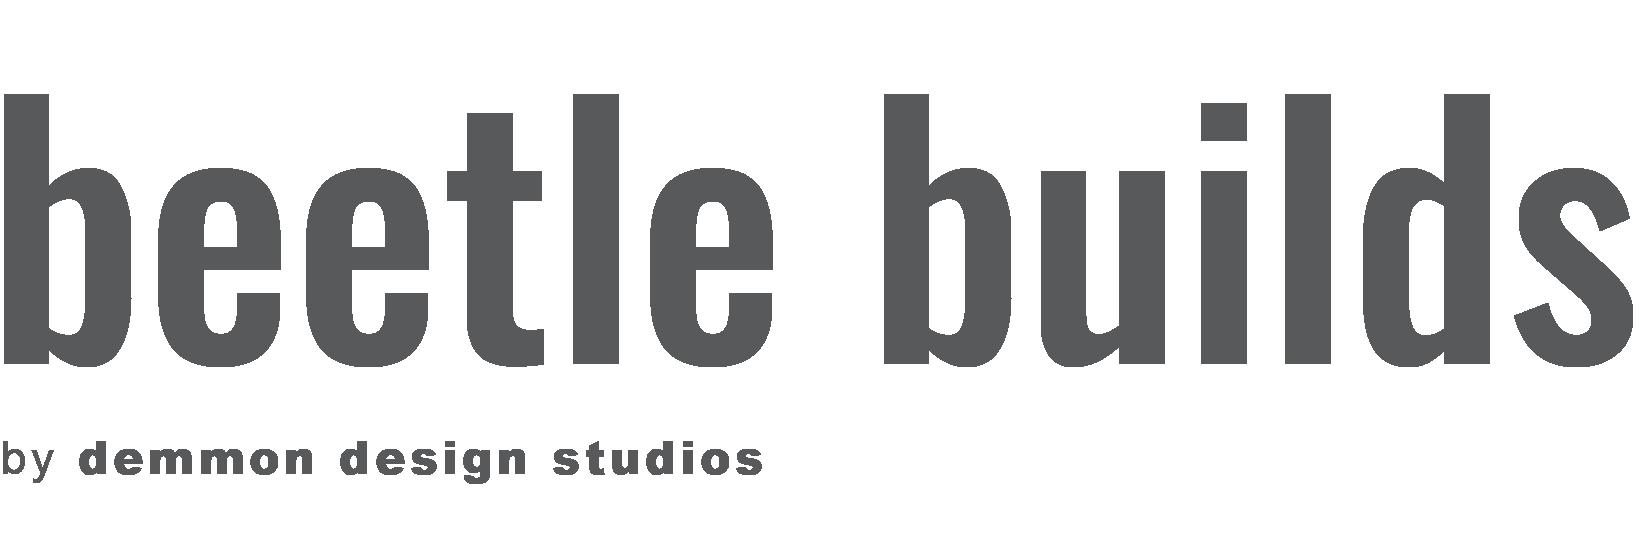 demmon design studios-06.png